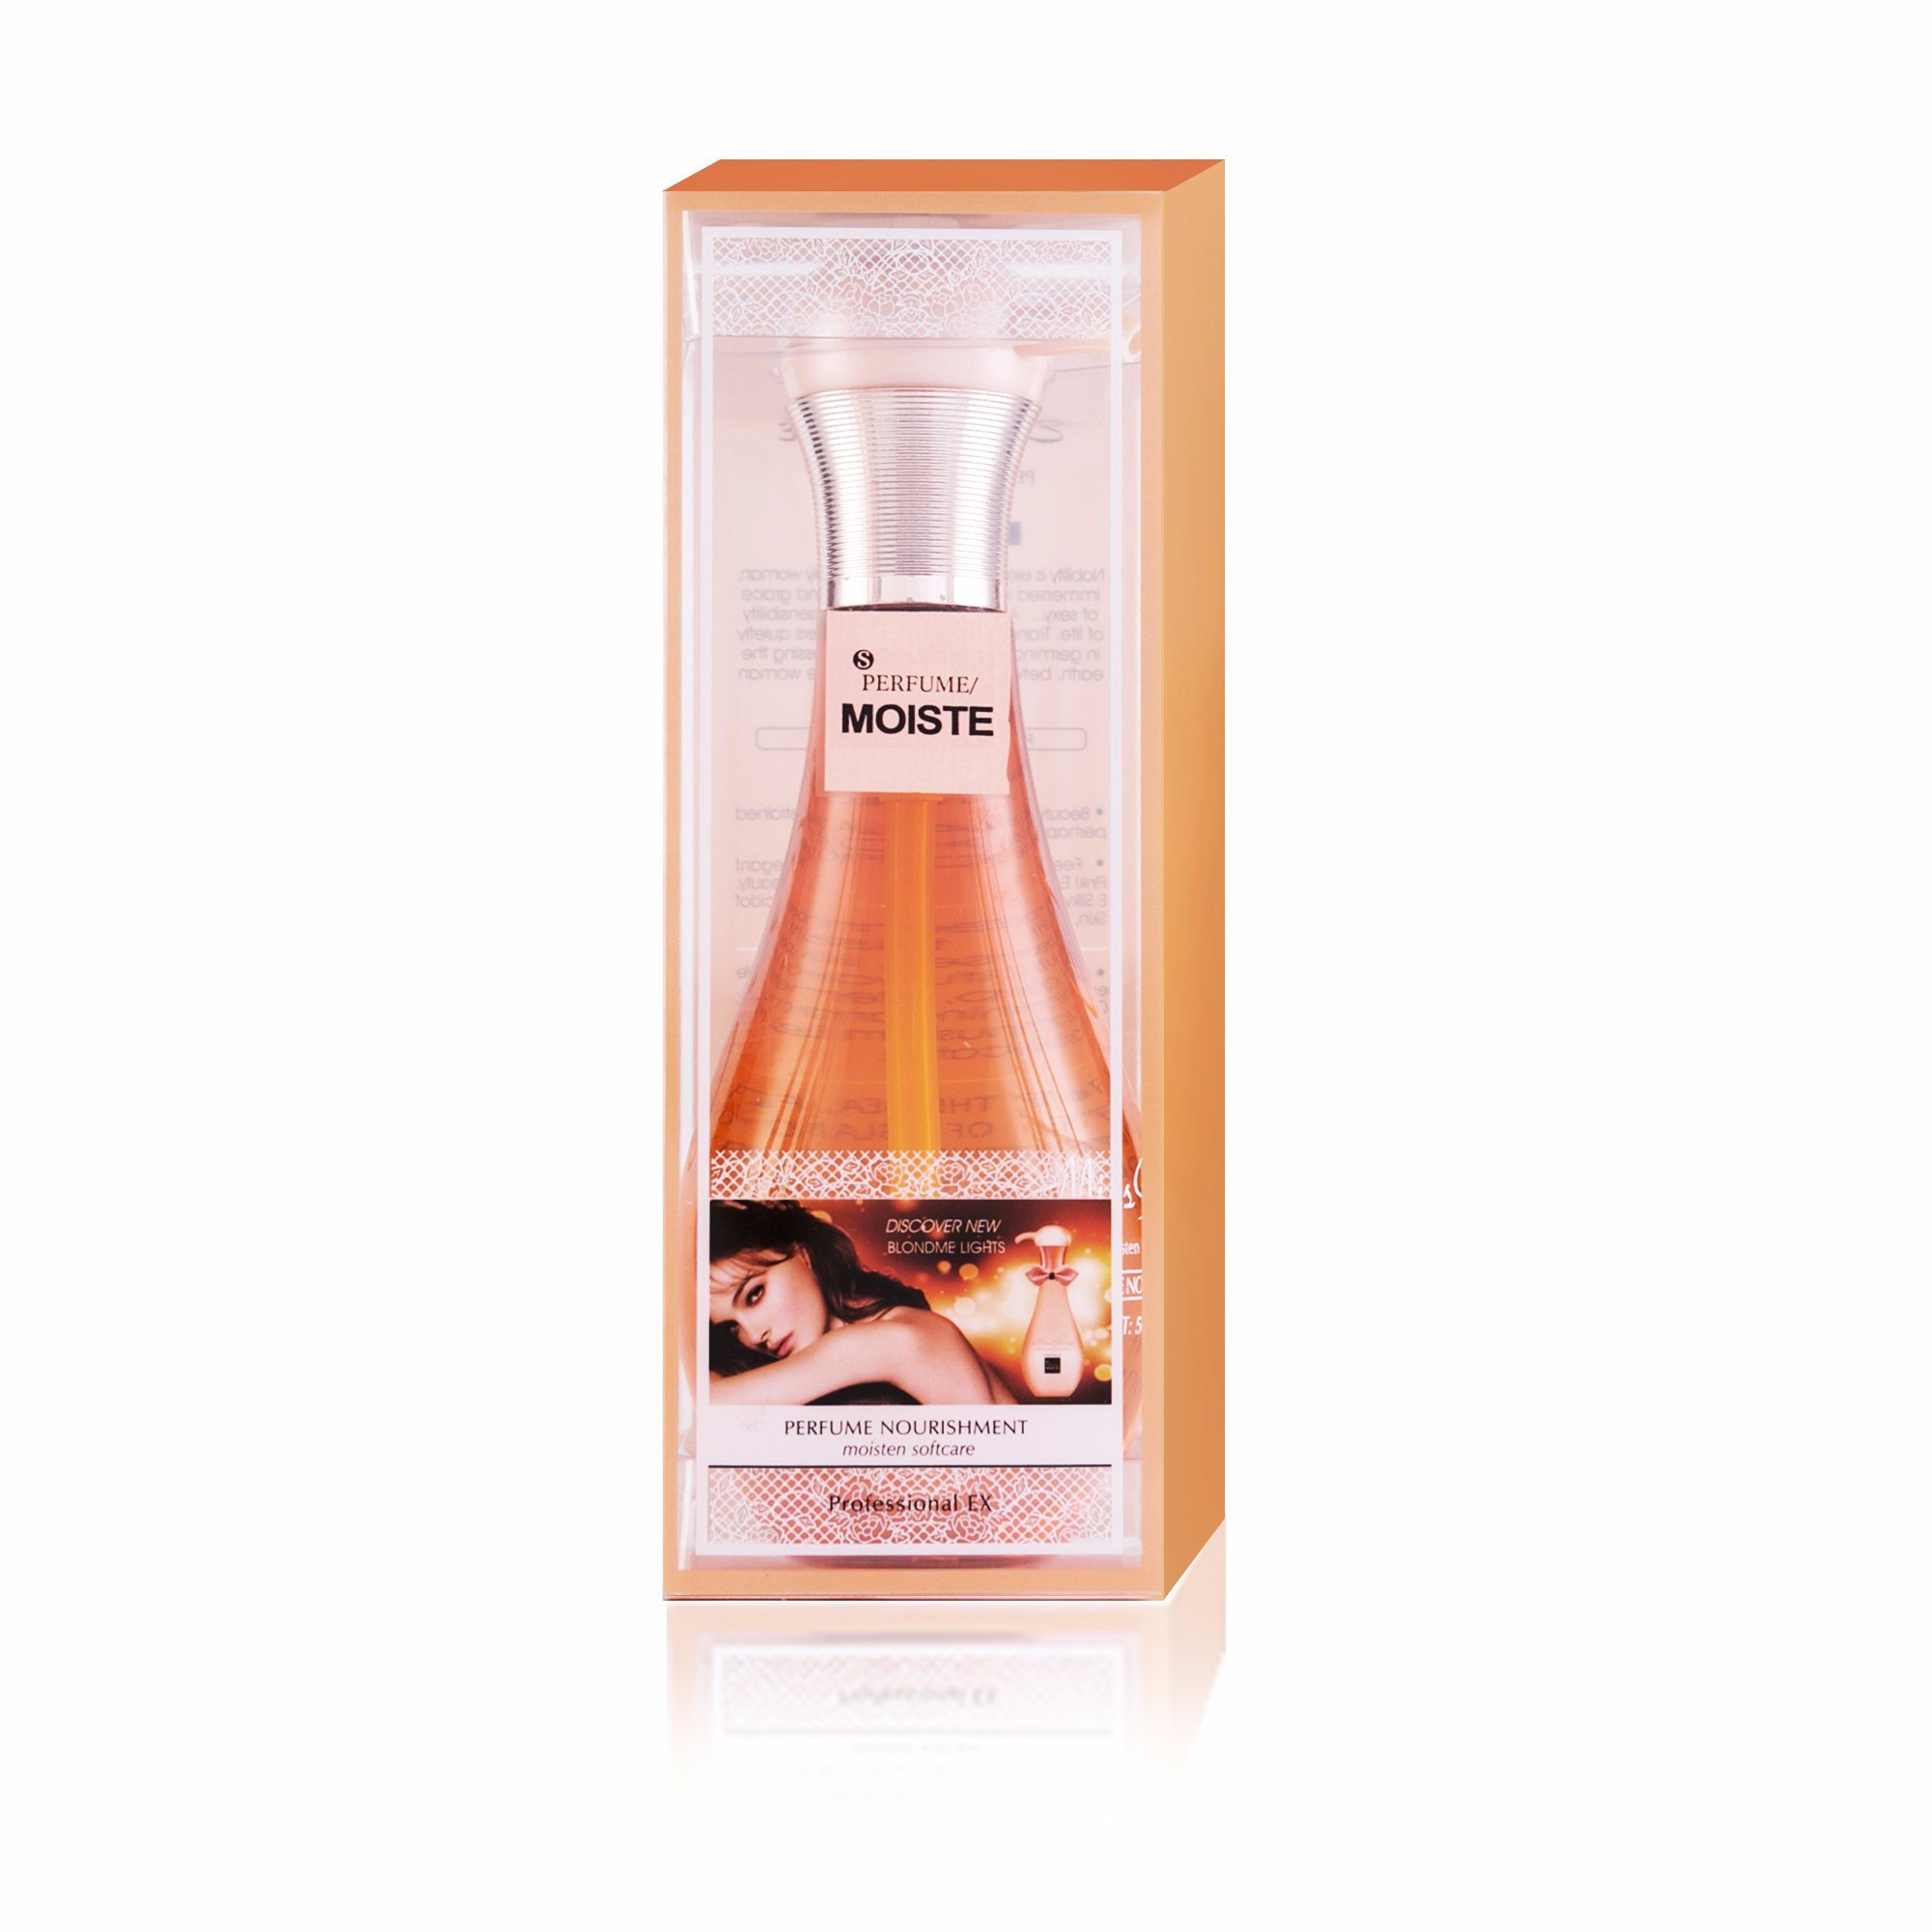 Washami Miss Grace Perfume Nourishment Bath Shower Gel